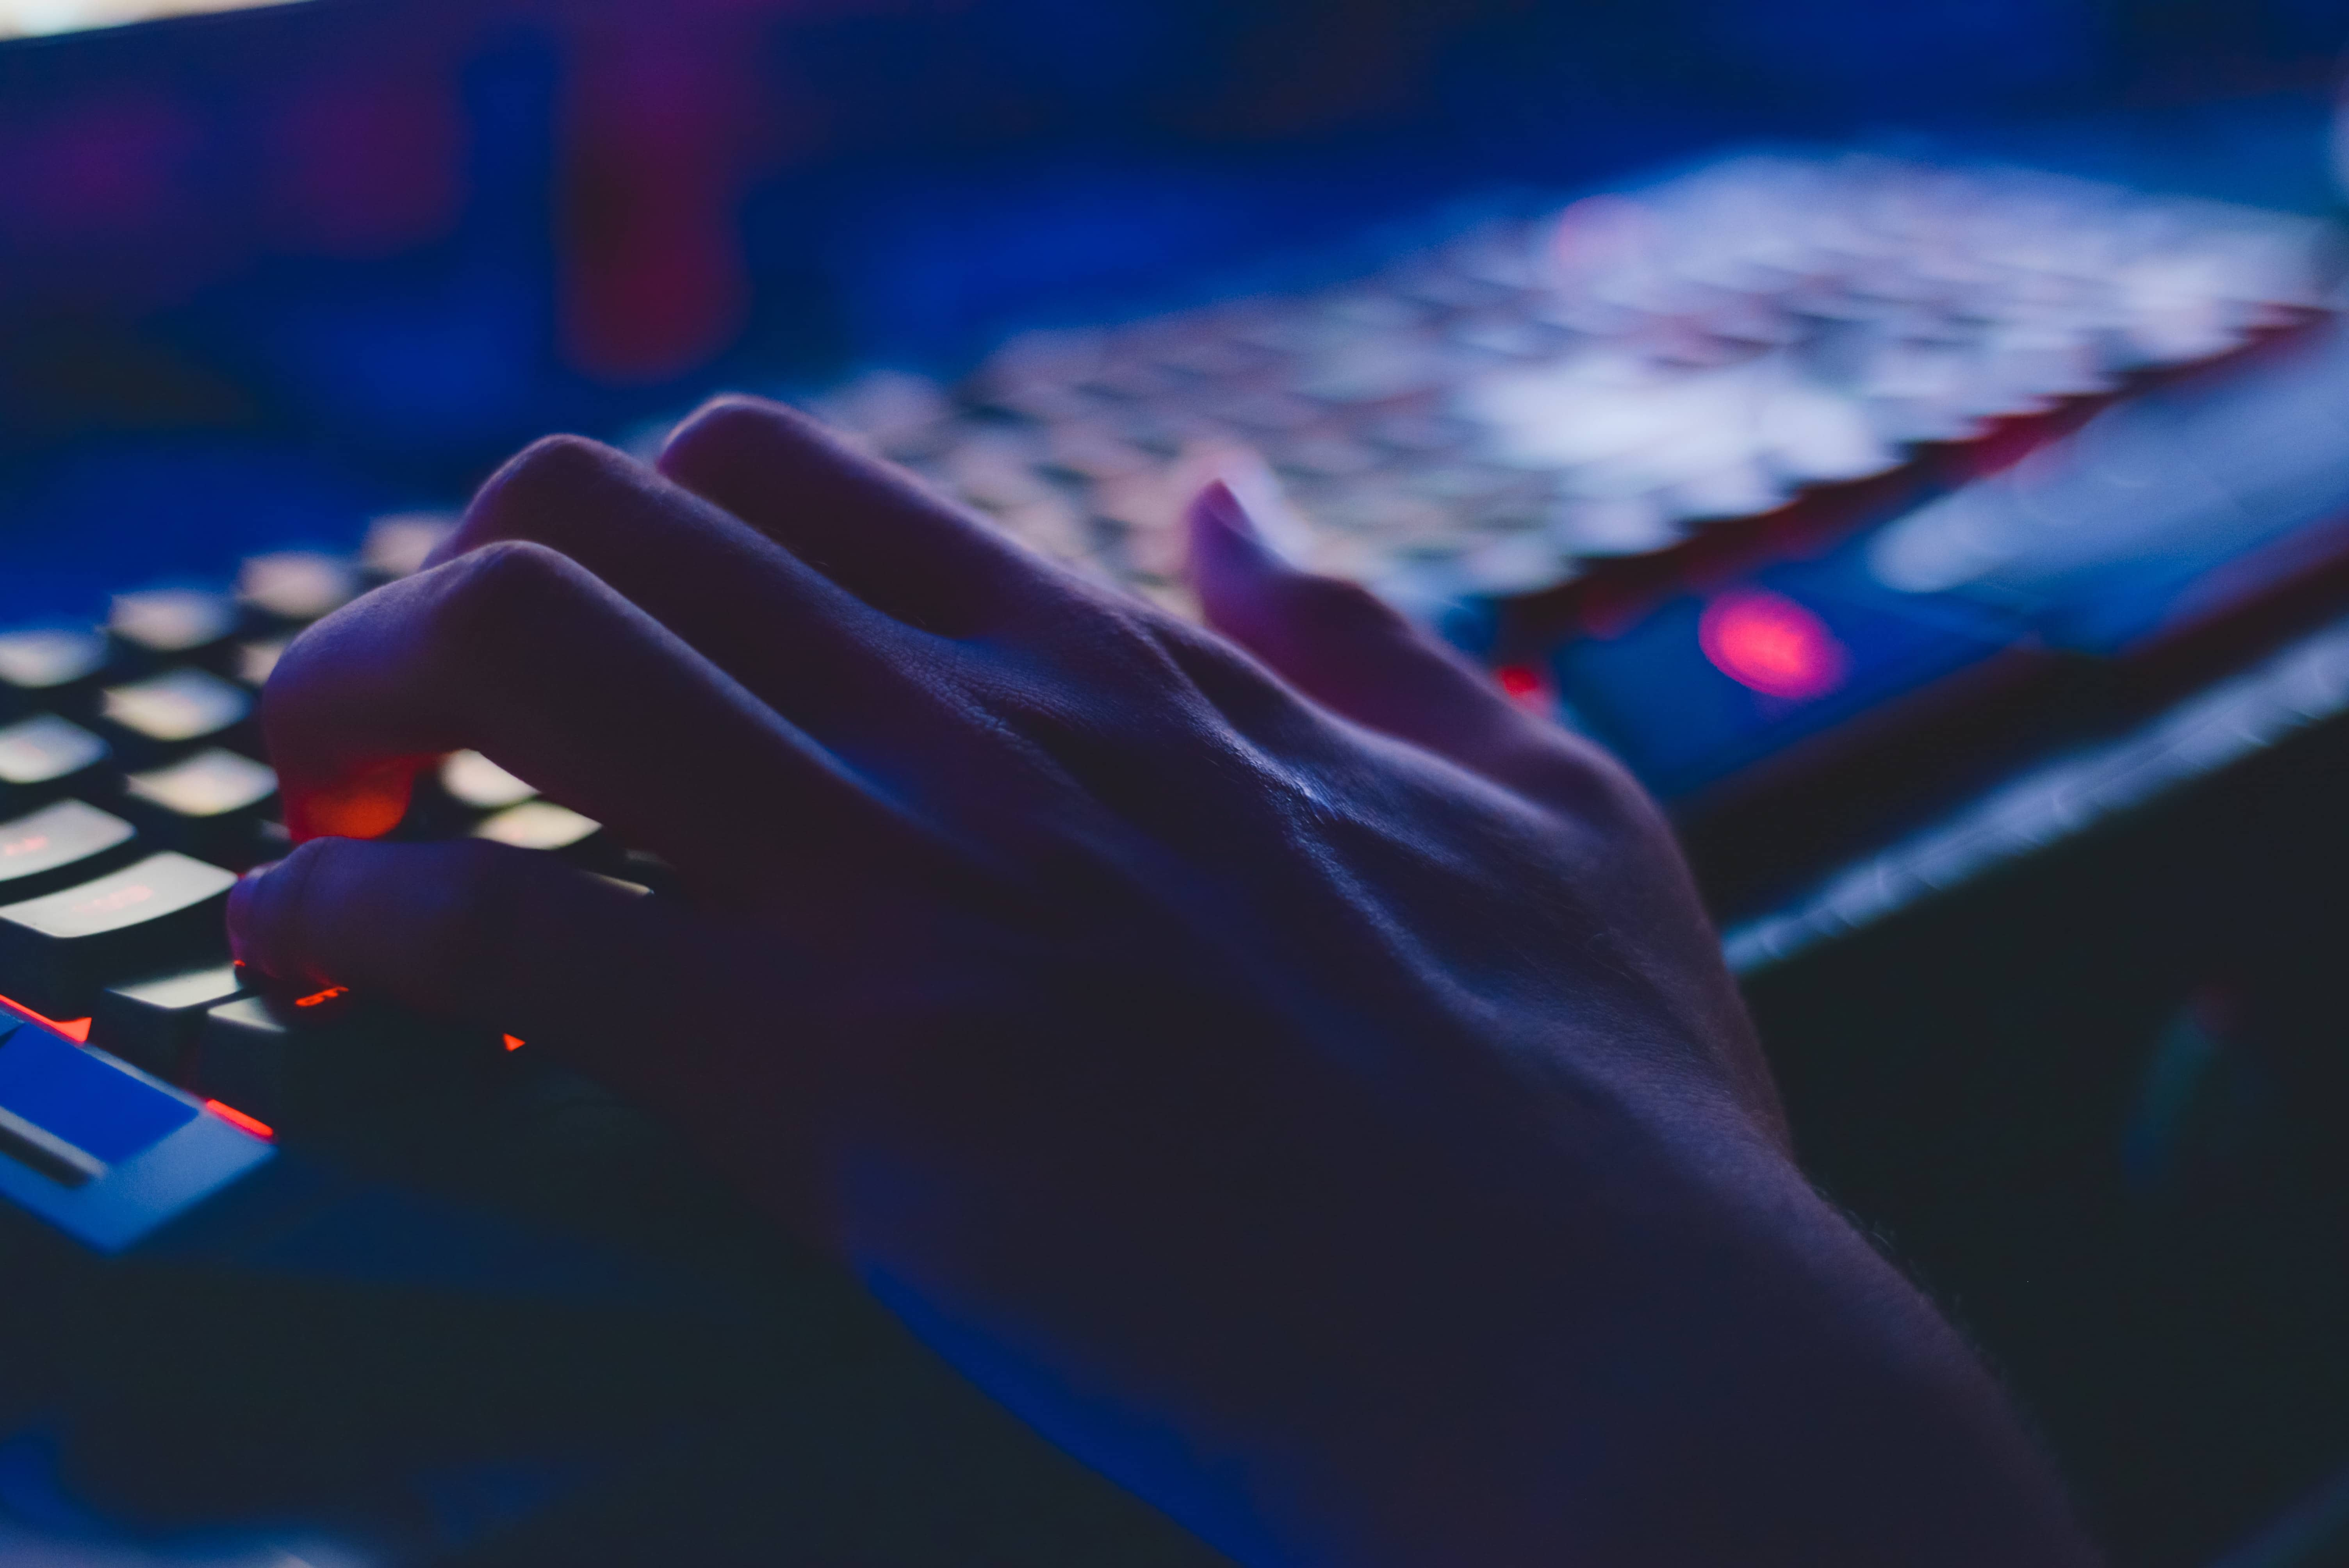 hacker typing on computer keyboard